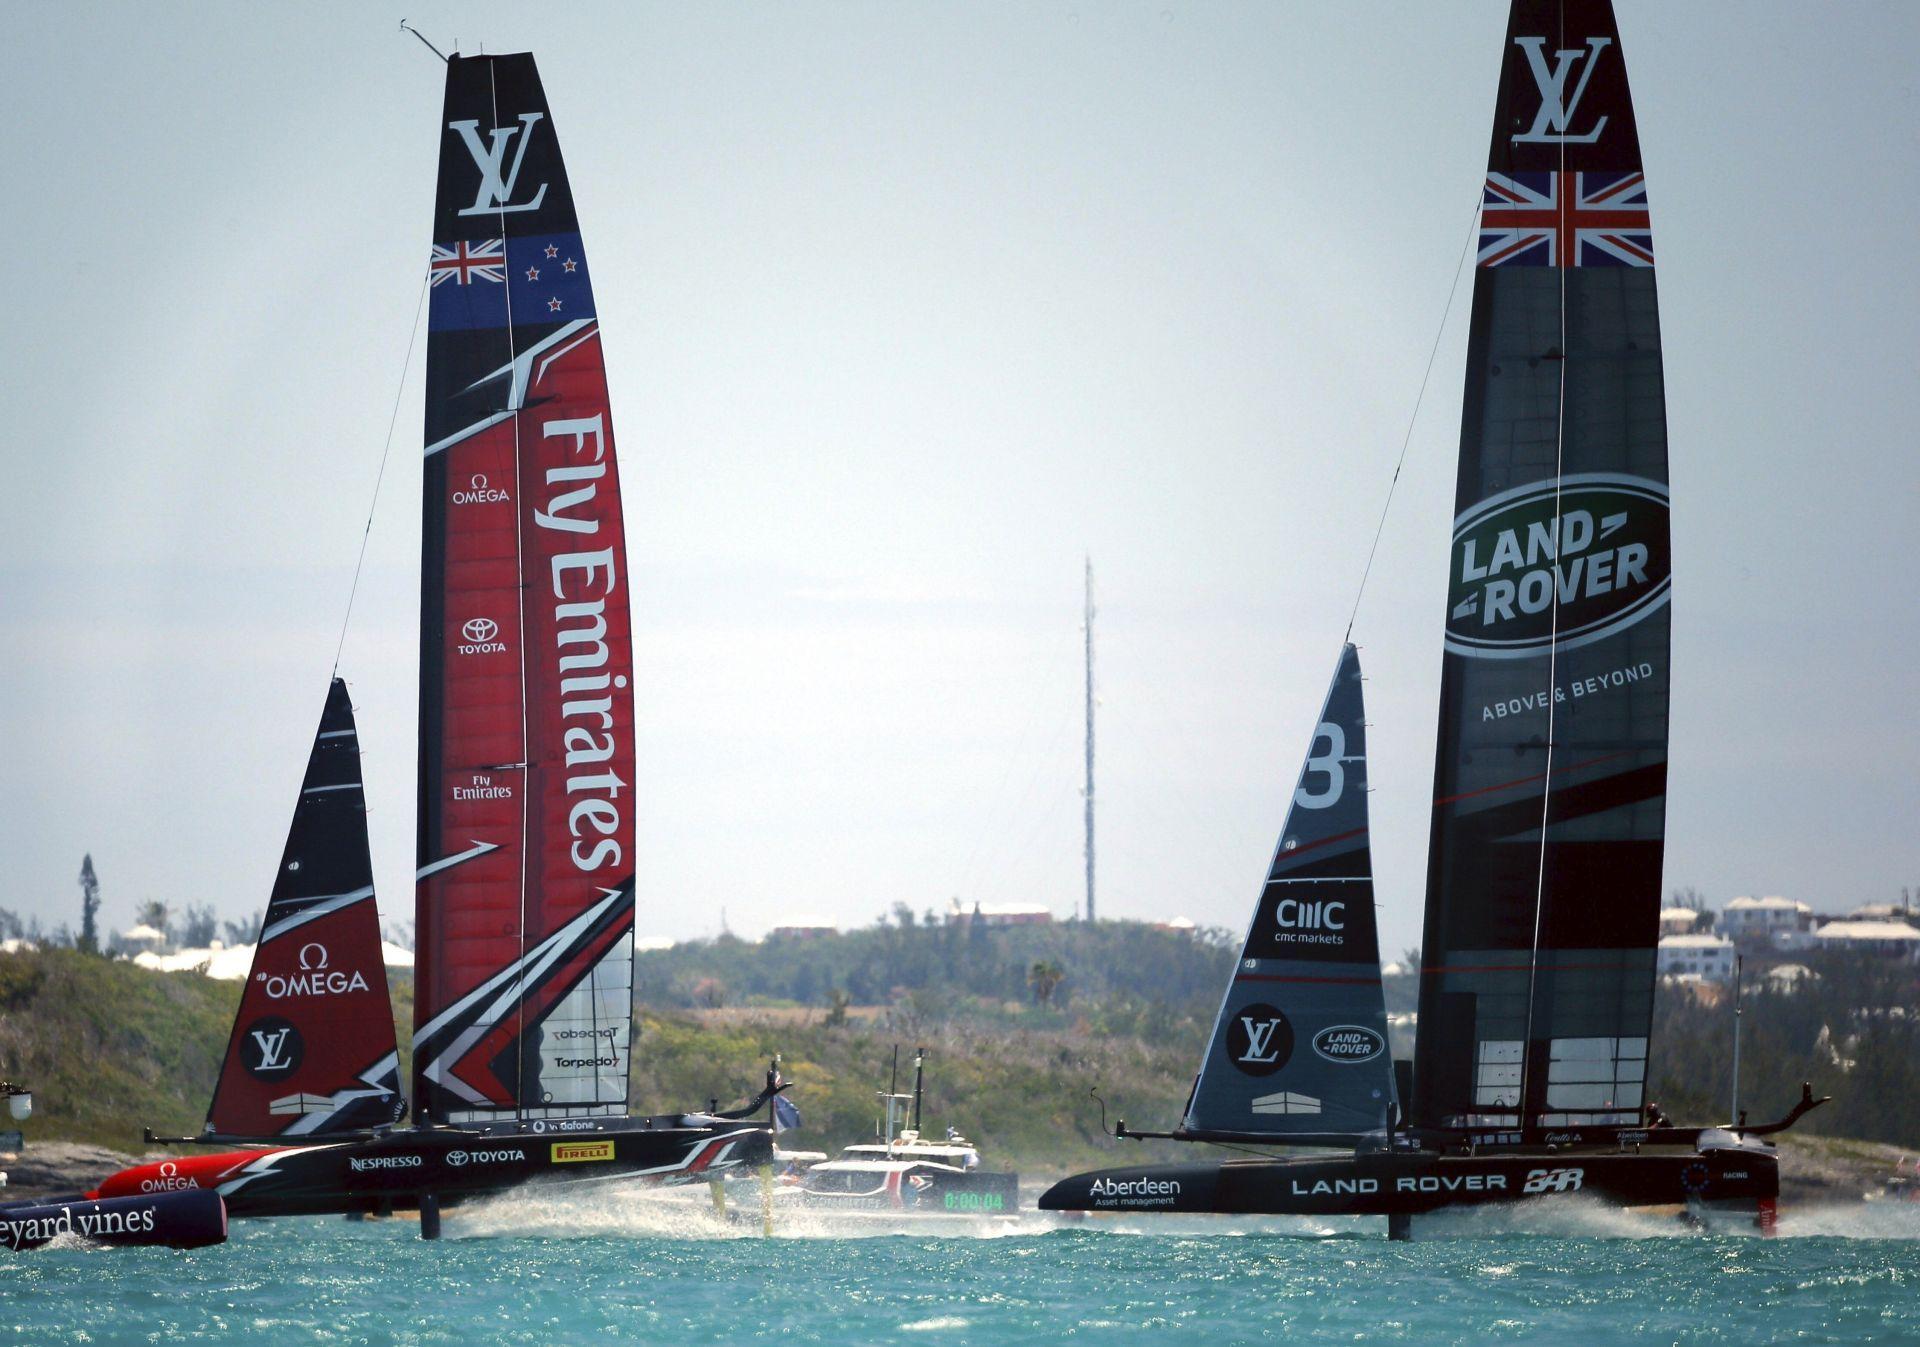 El Team New Zealand supera por 2-0 al Land Rover BAR